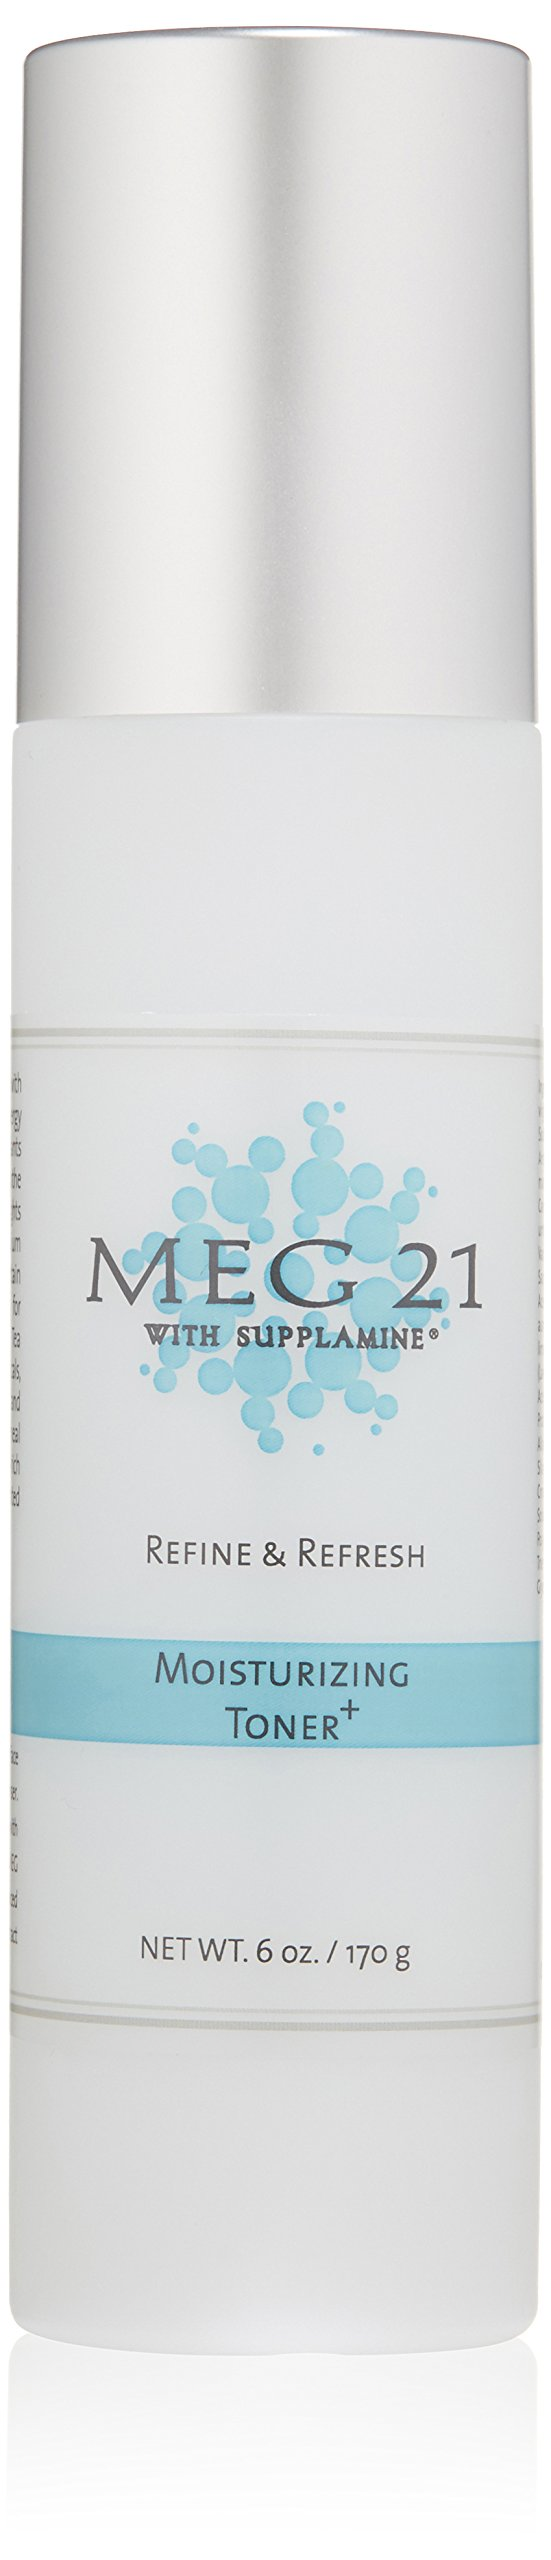 MEG 21 Refine and Refresh Moisturizing Toner, 6 Oz